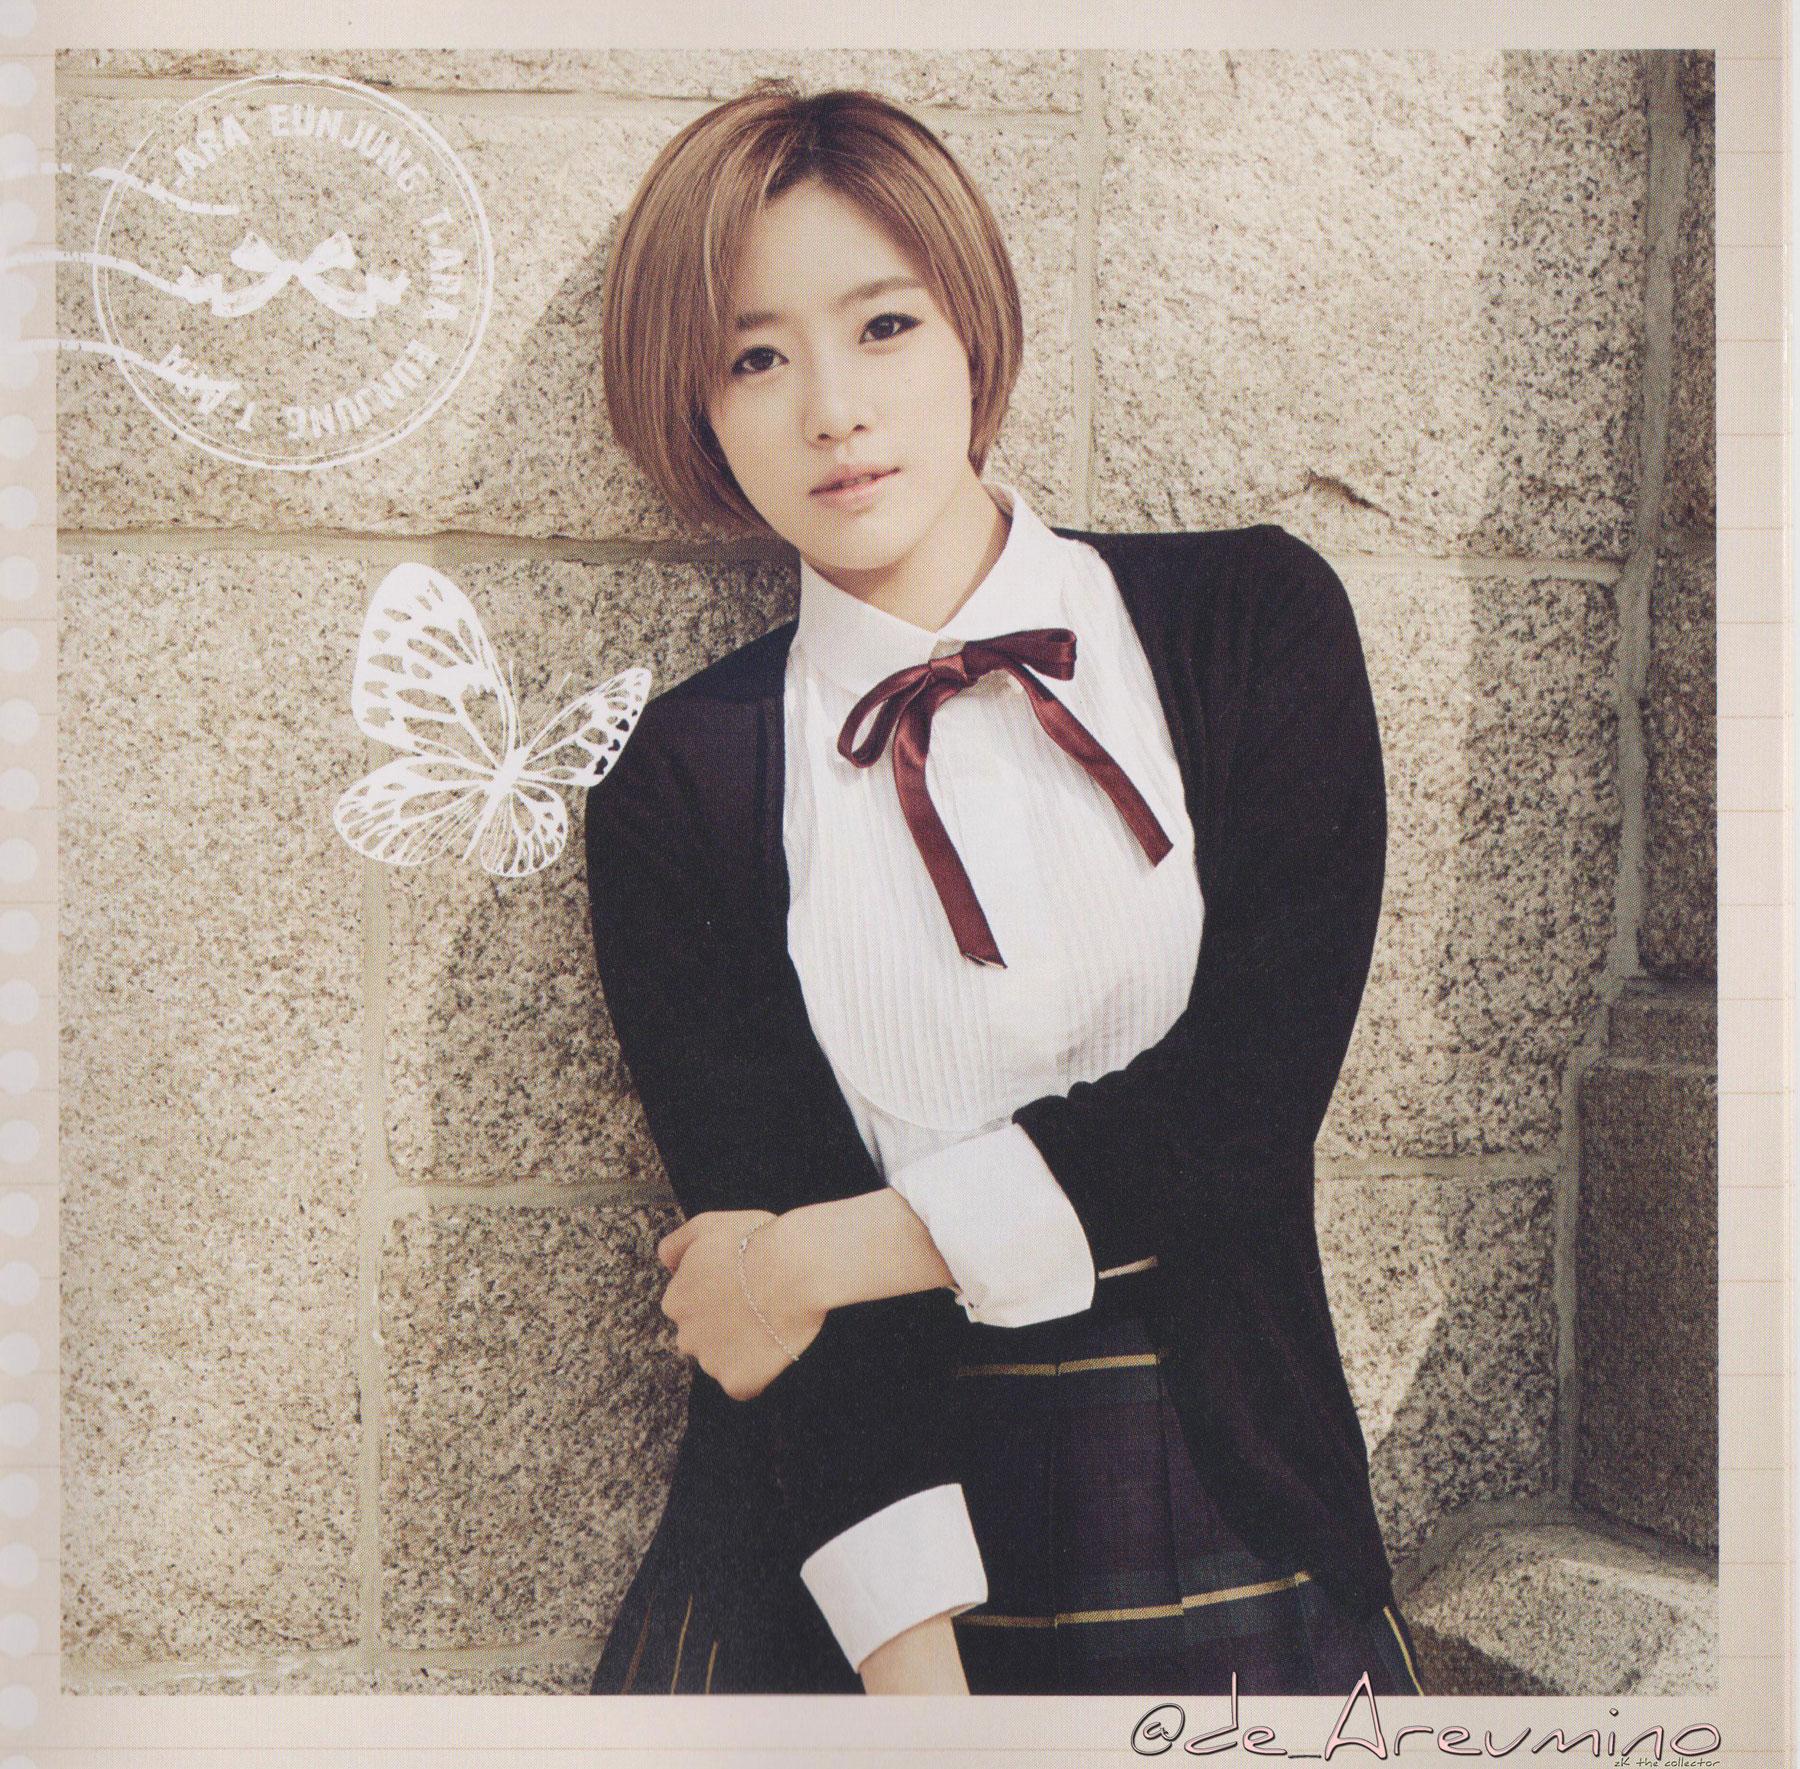 T-ara Eunjung Gossip Girls album